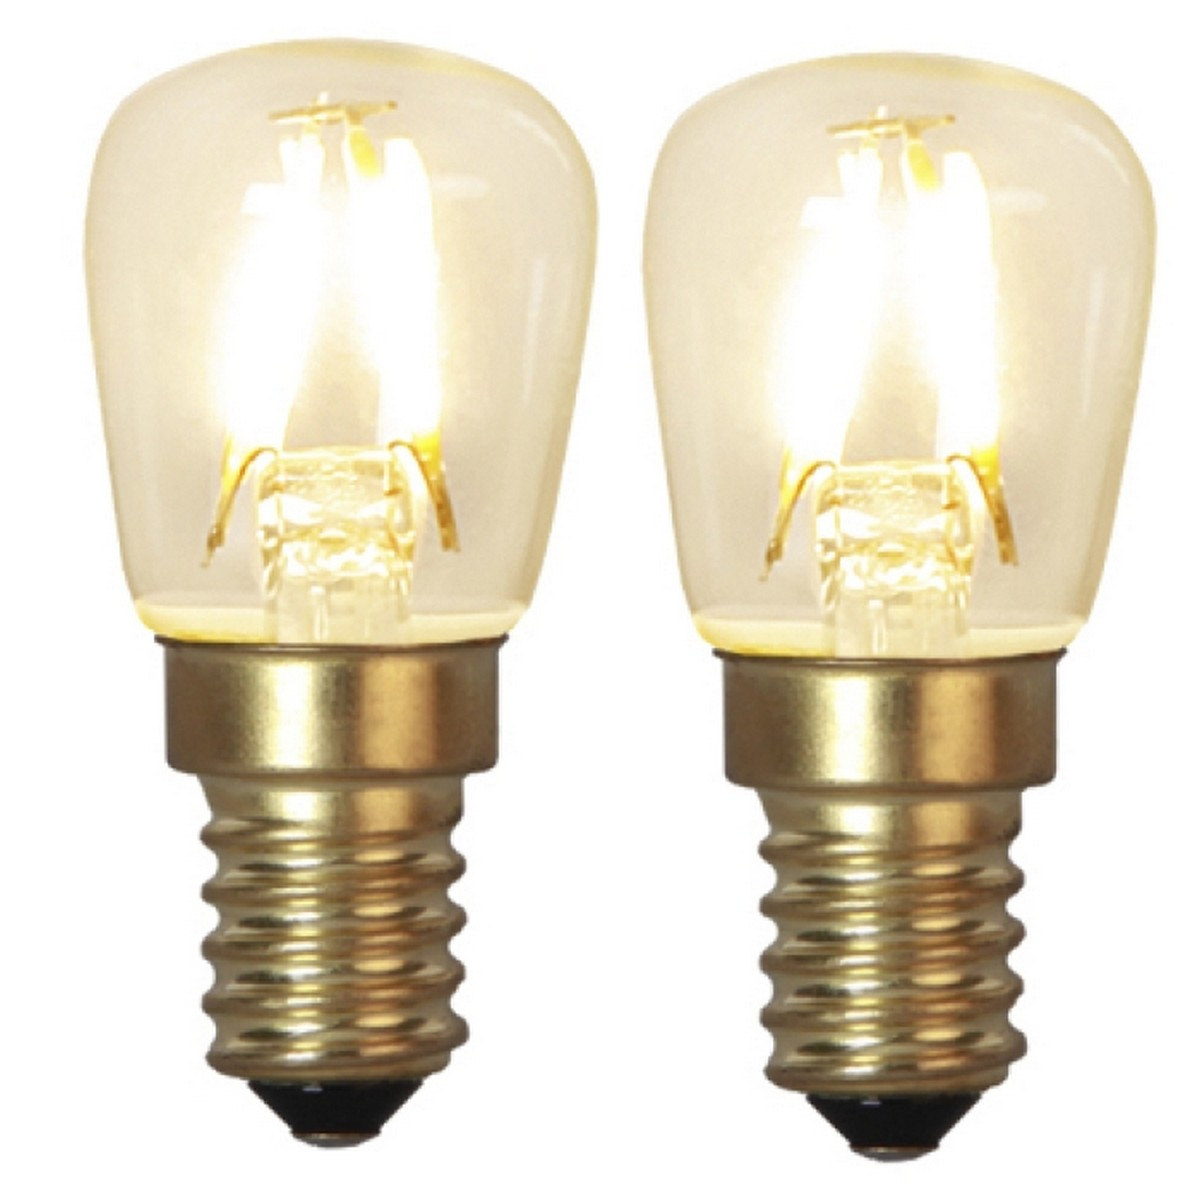 Helt nya ljusihem.se | LED-lampa E14 2-pack Soft Glow | Star Trading GE-99